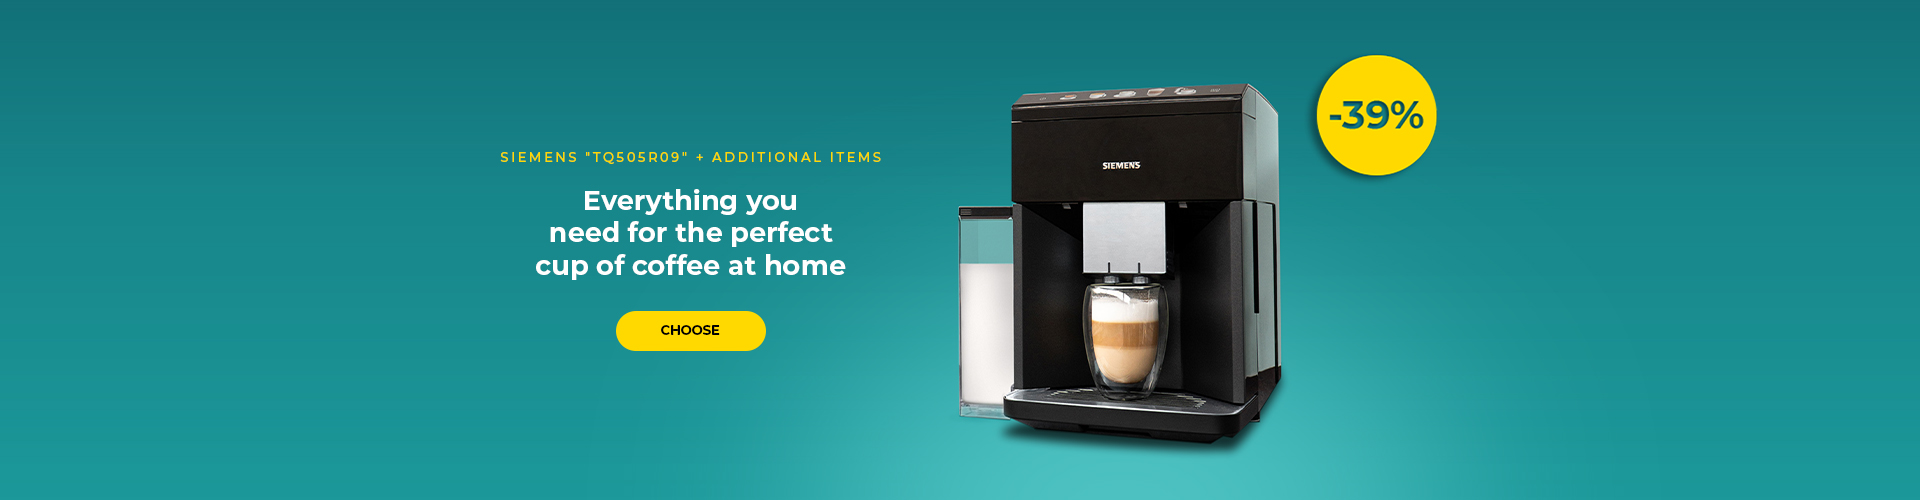 "Coffee machine Siemens ""TQ505R09"" + additional items"